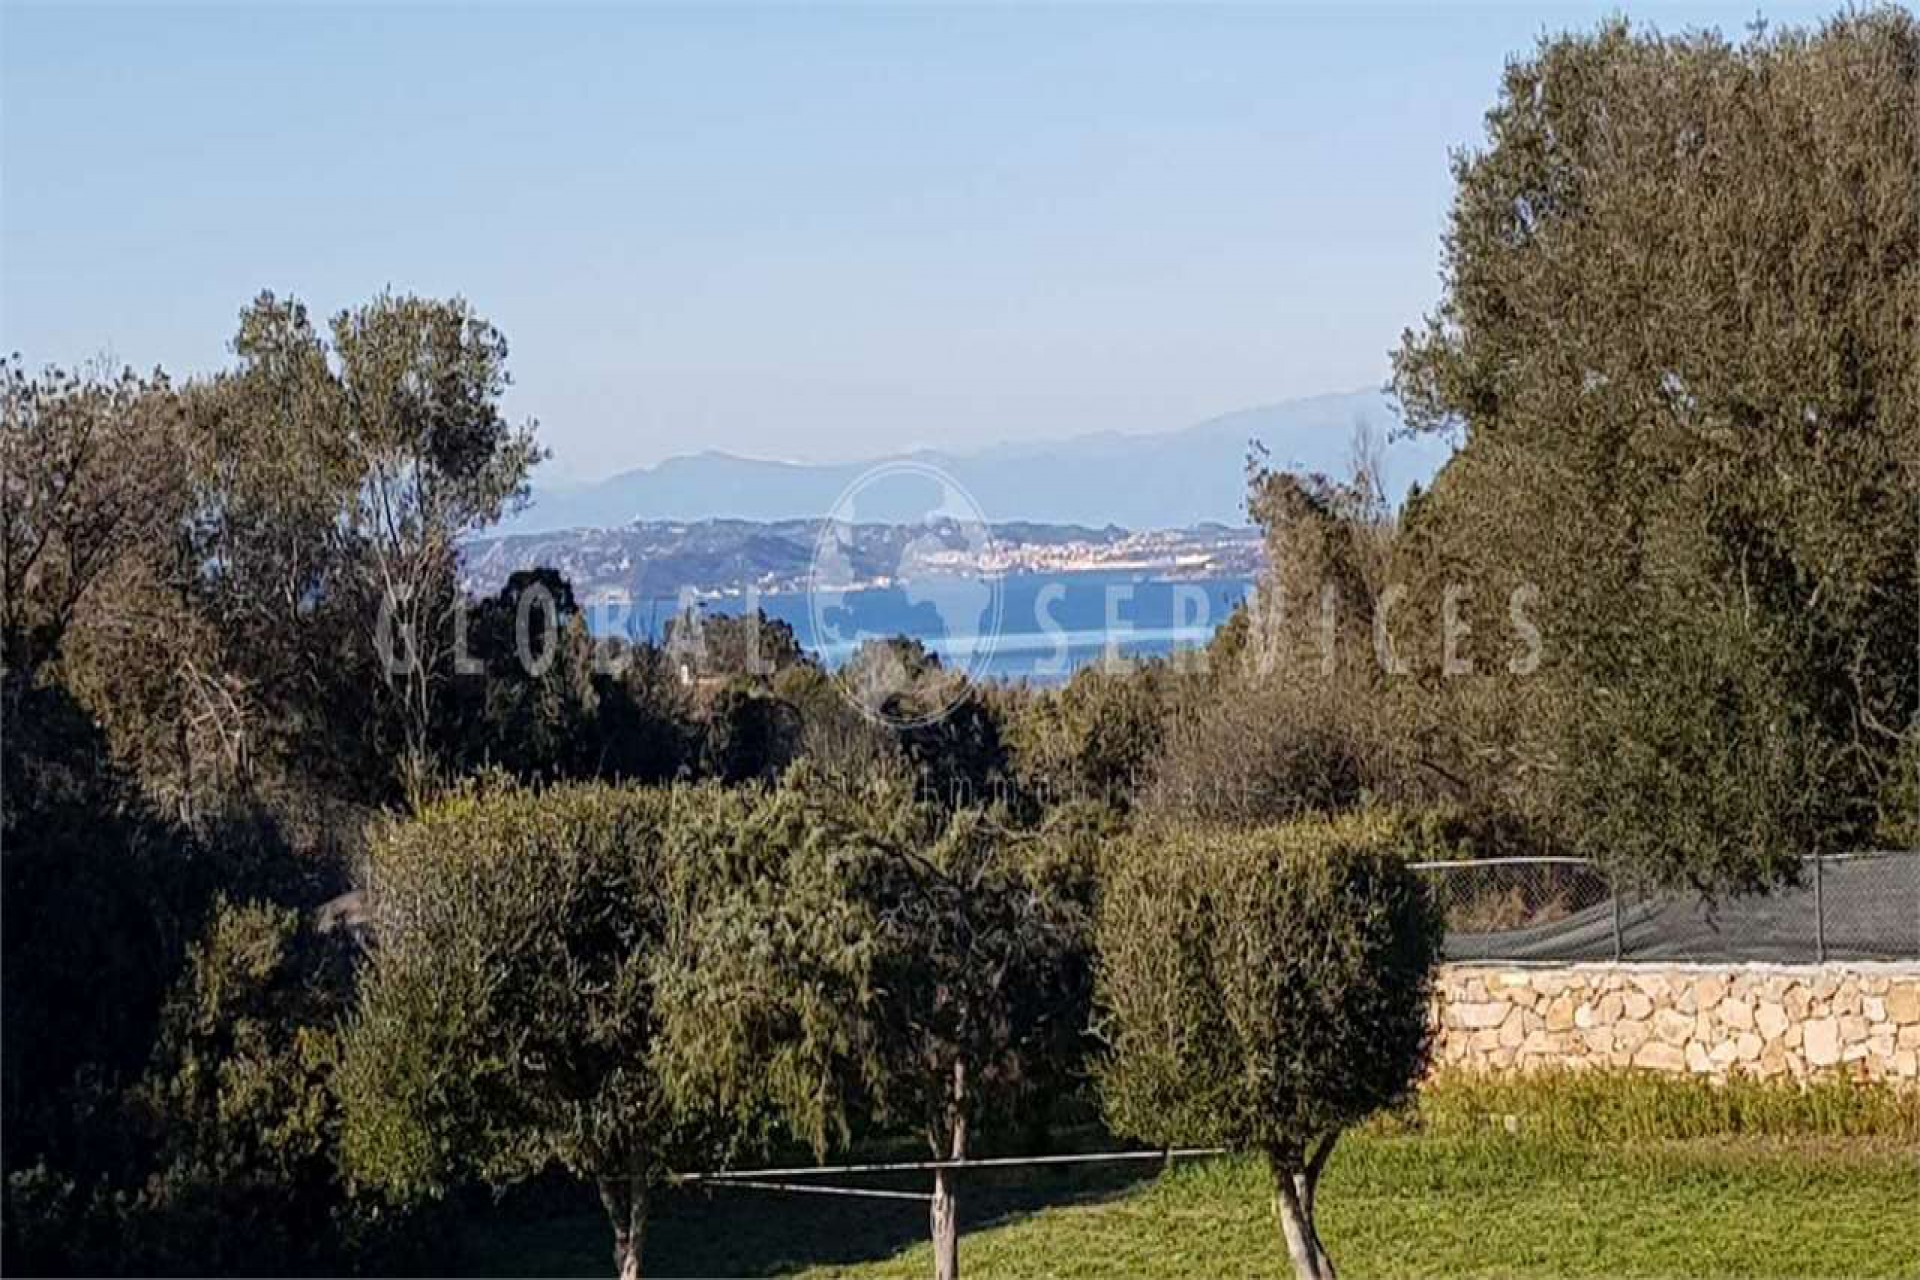 Baia Sardinia villa with swimming pool for sale